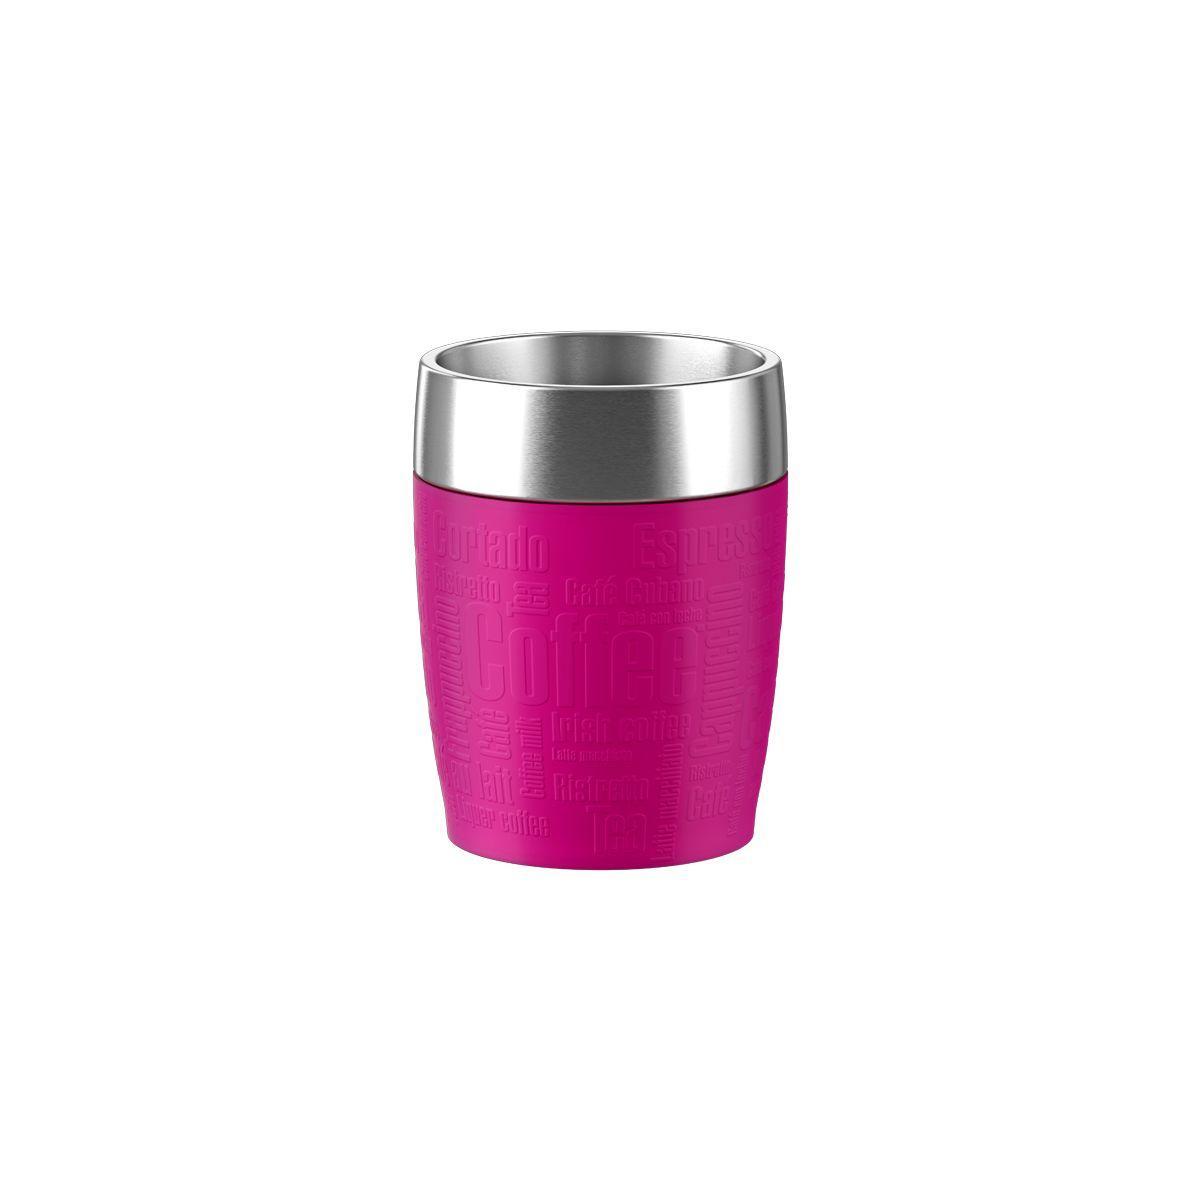 Mug emsa isotherme 0.2l inox/framboise - 5% de remise immédiate avec le code : cash5 (photo)